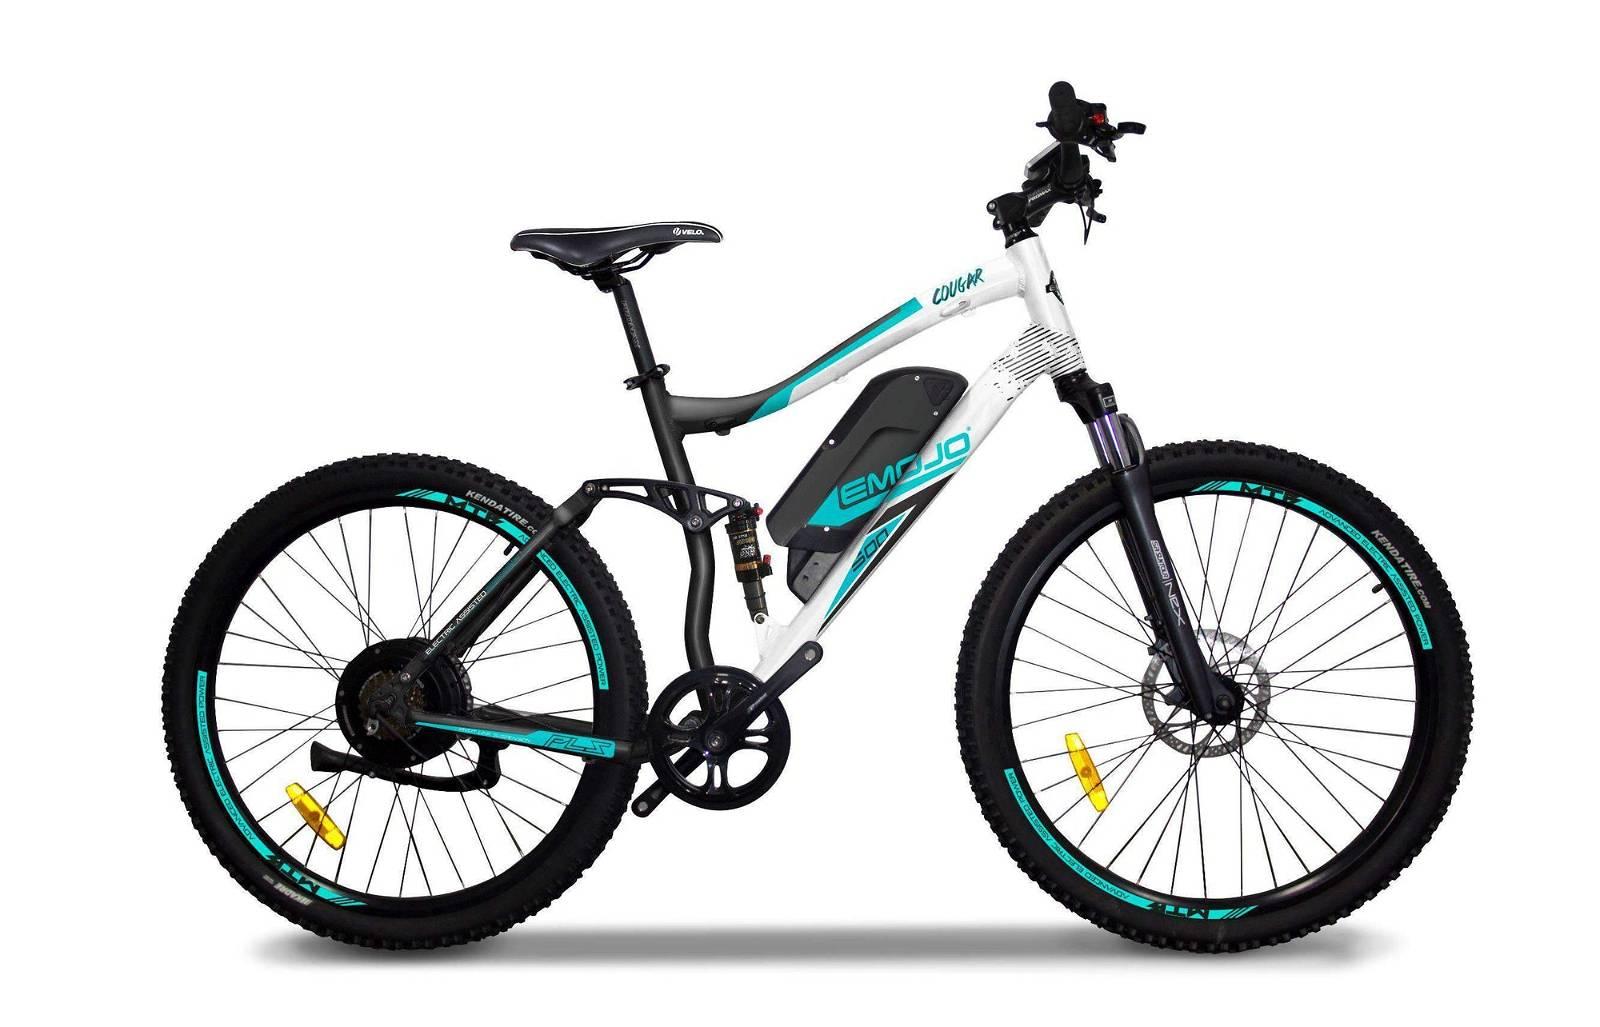 Emojo Cougar Electric Mountain Bike